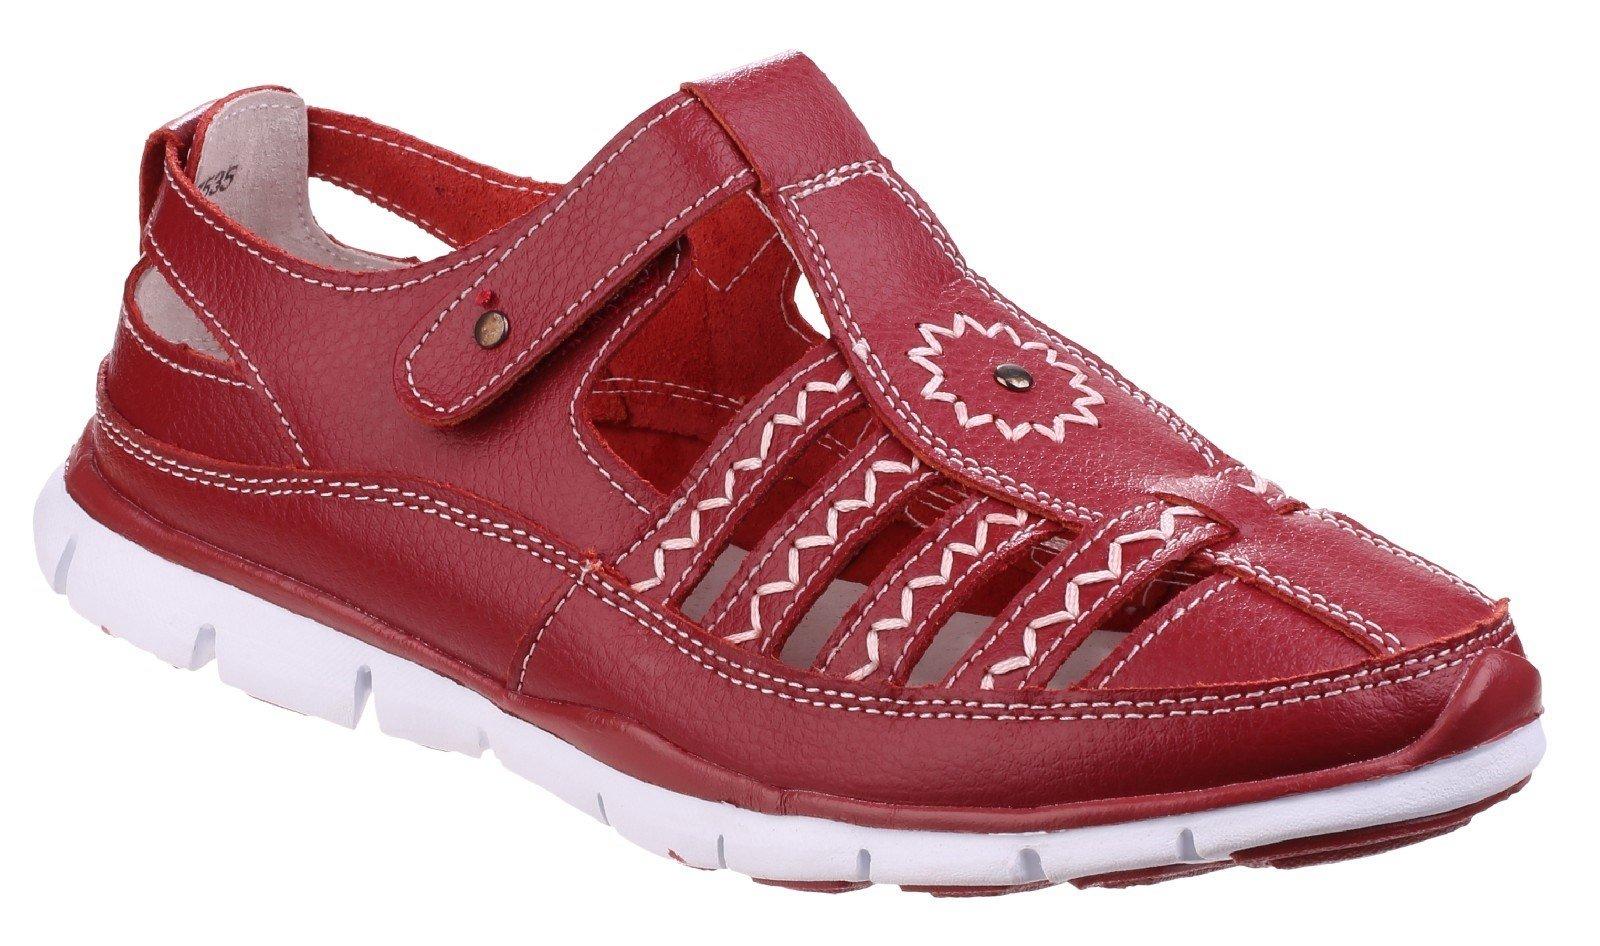 Fleet & Foster Women's Cabernet Memory Sandal Various Colours 24946-41278 - Red 3